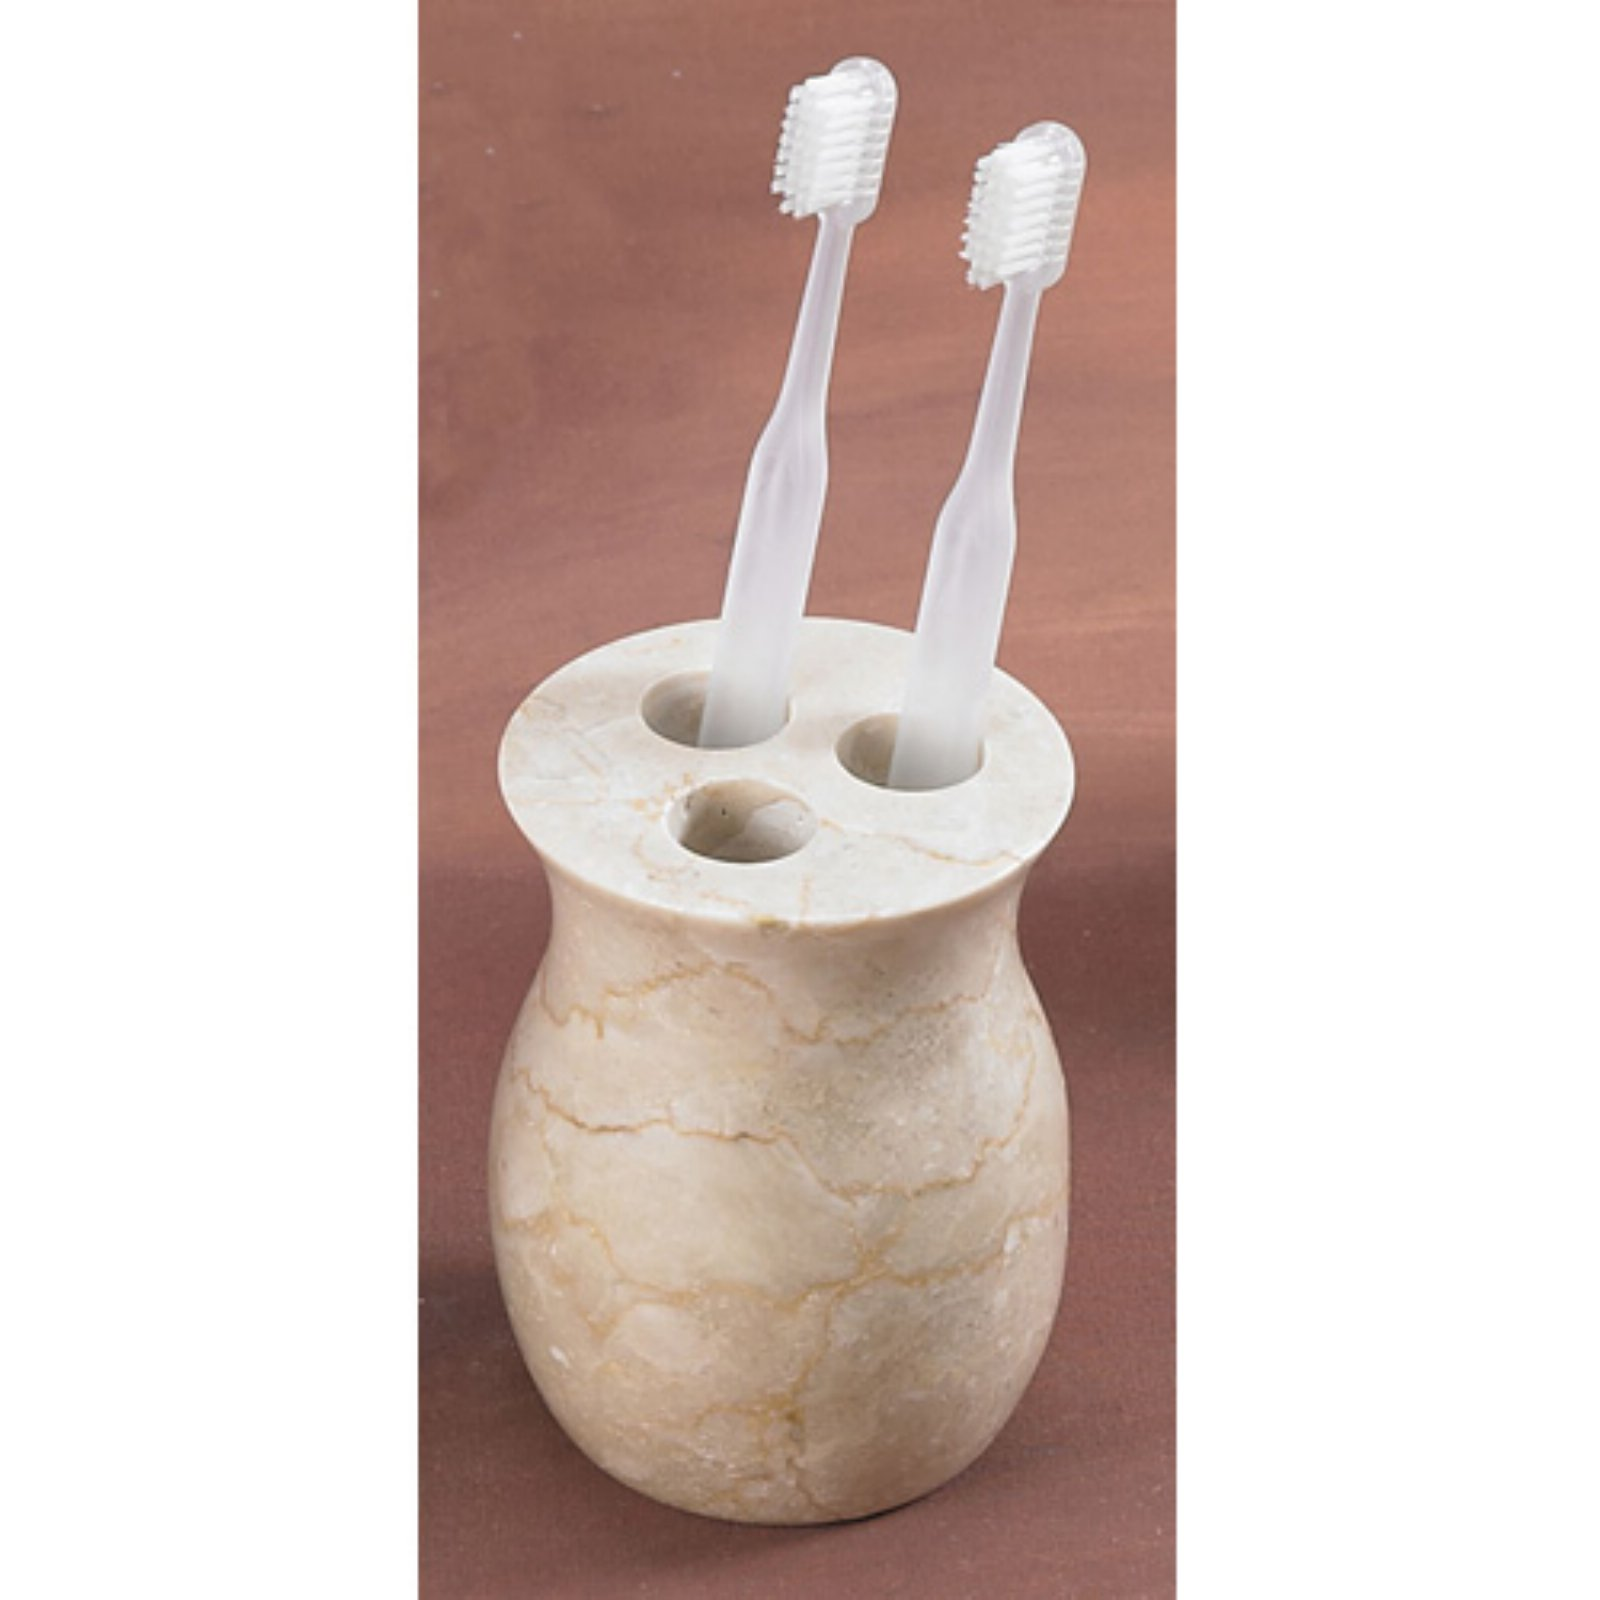 Creative Home Marble Vase Toothbrush Holder